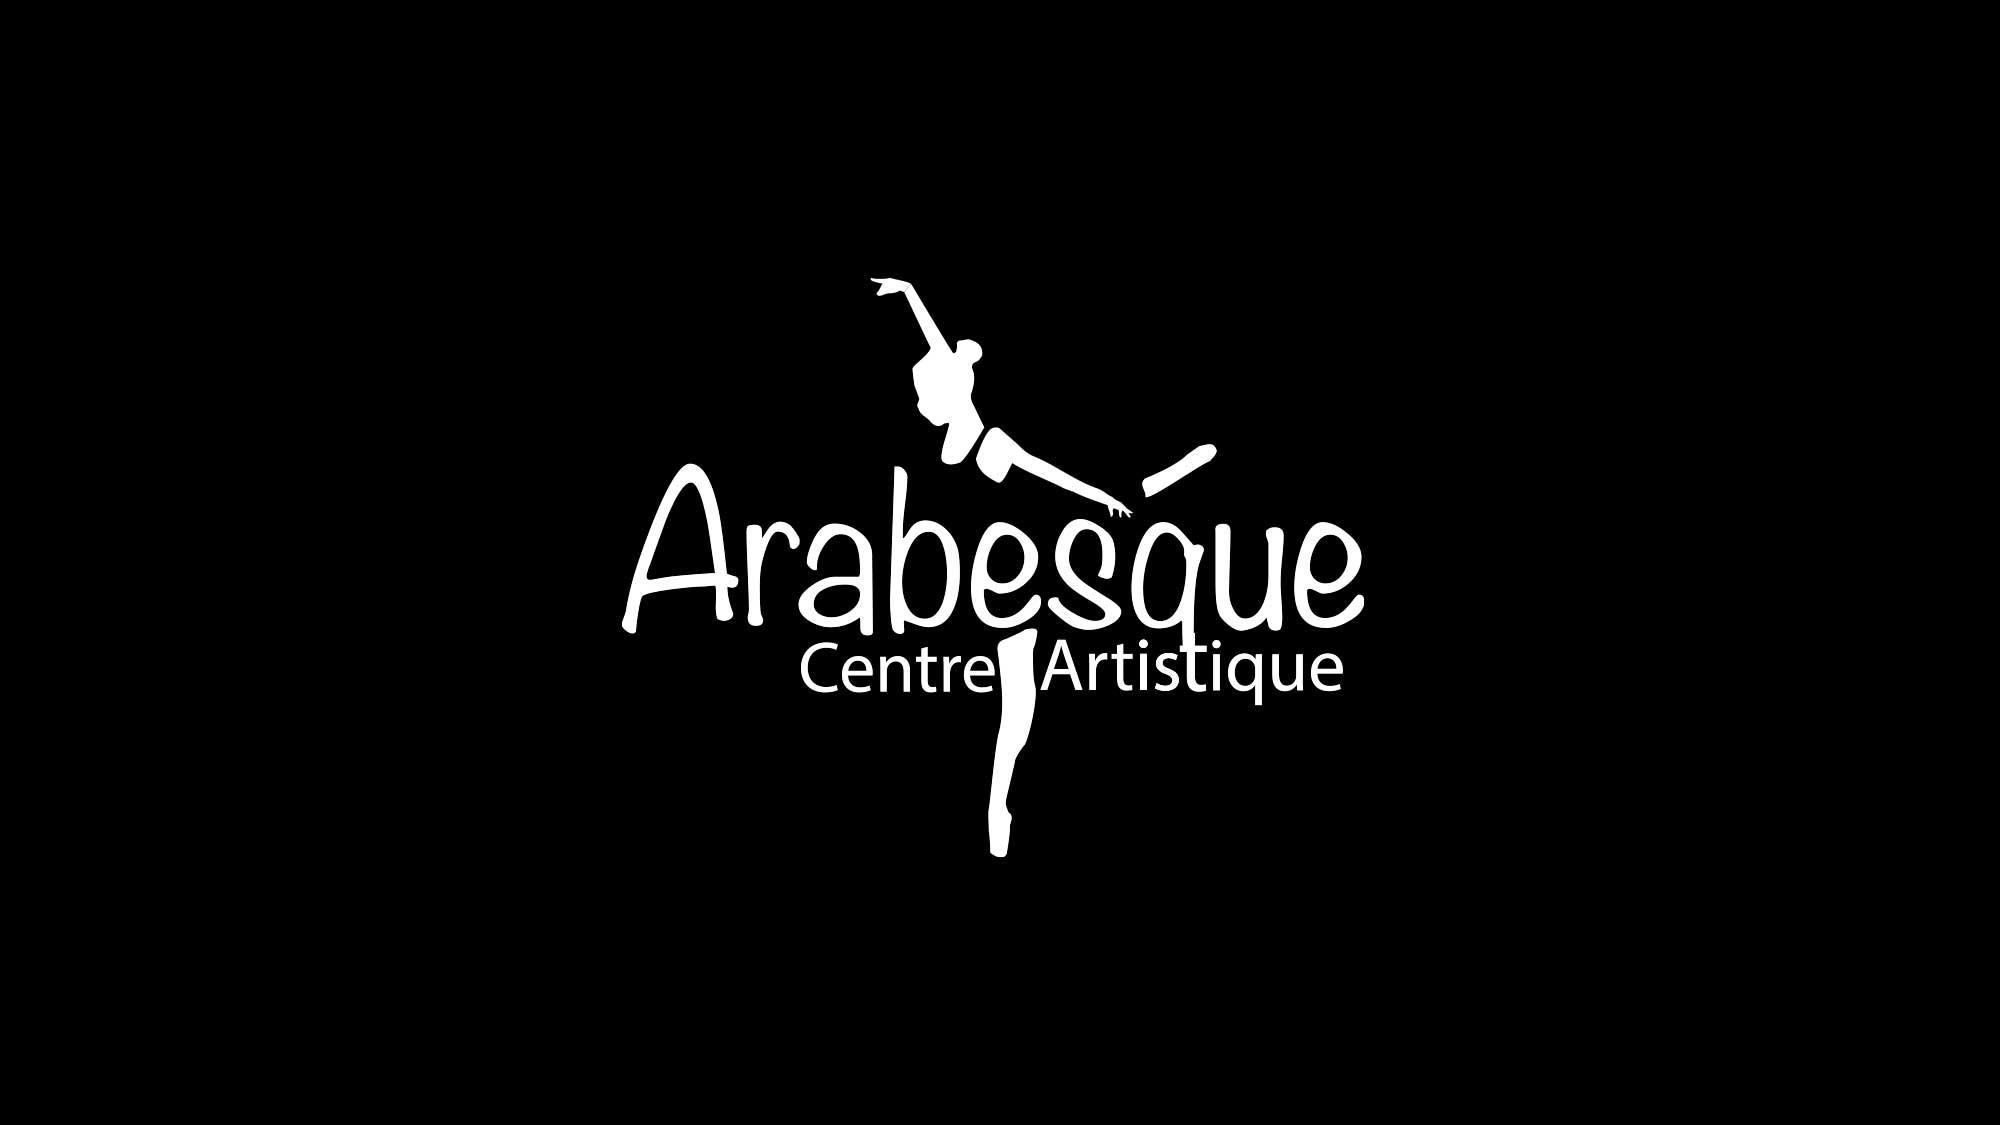 CENTRE ARTISTIQUE ARABESQUE